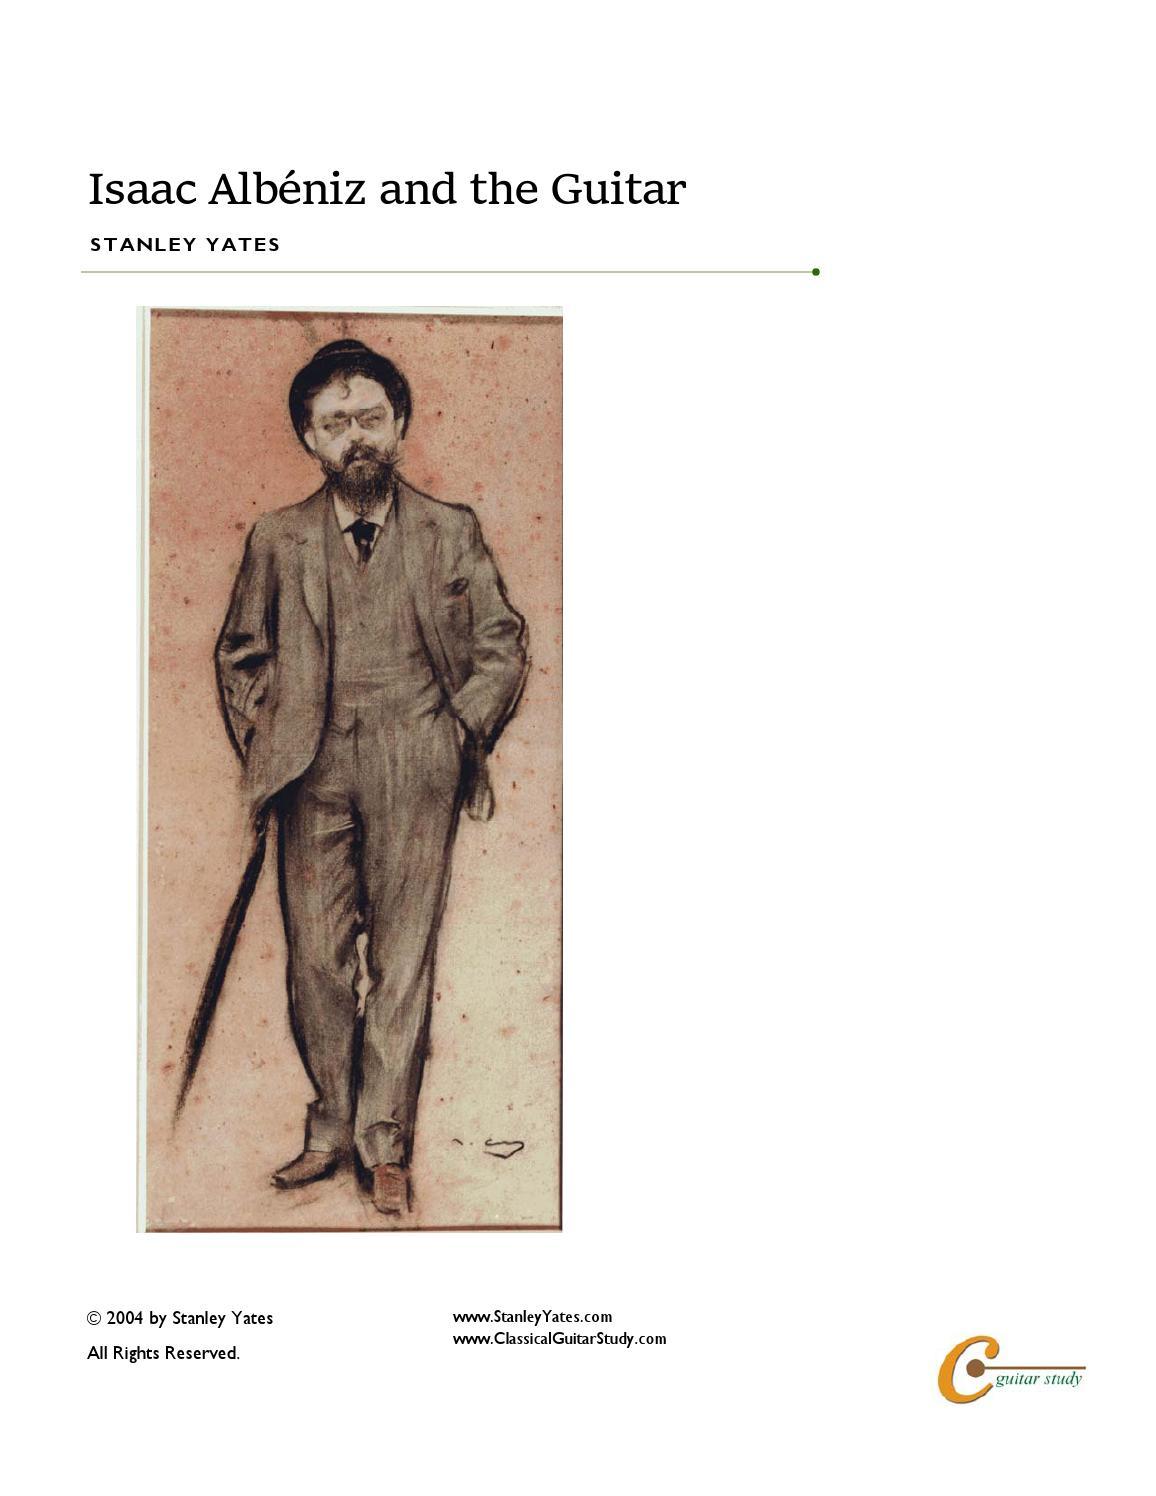 Albeniz Sevilla Sevillanas No.3 De La Suite Espanola romero Guitar Music Book